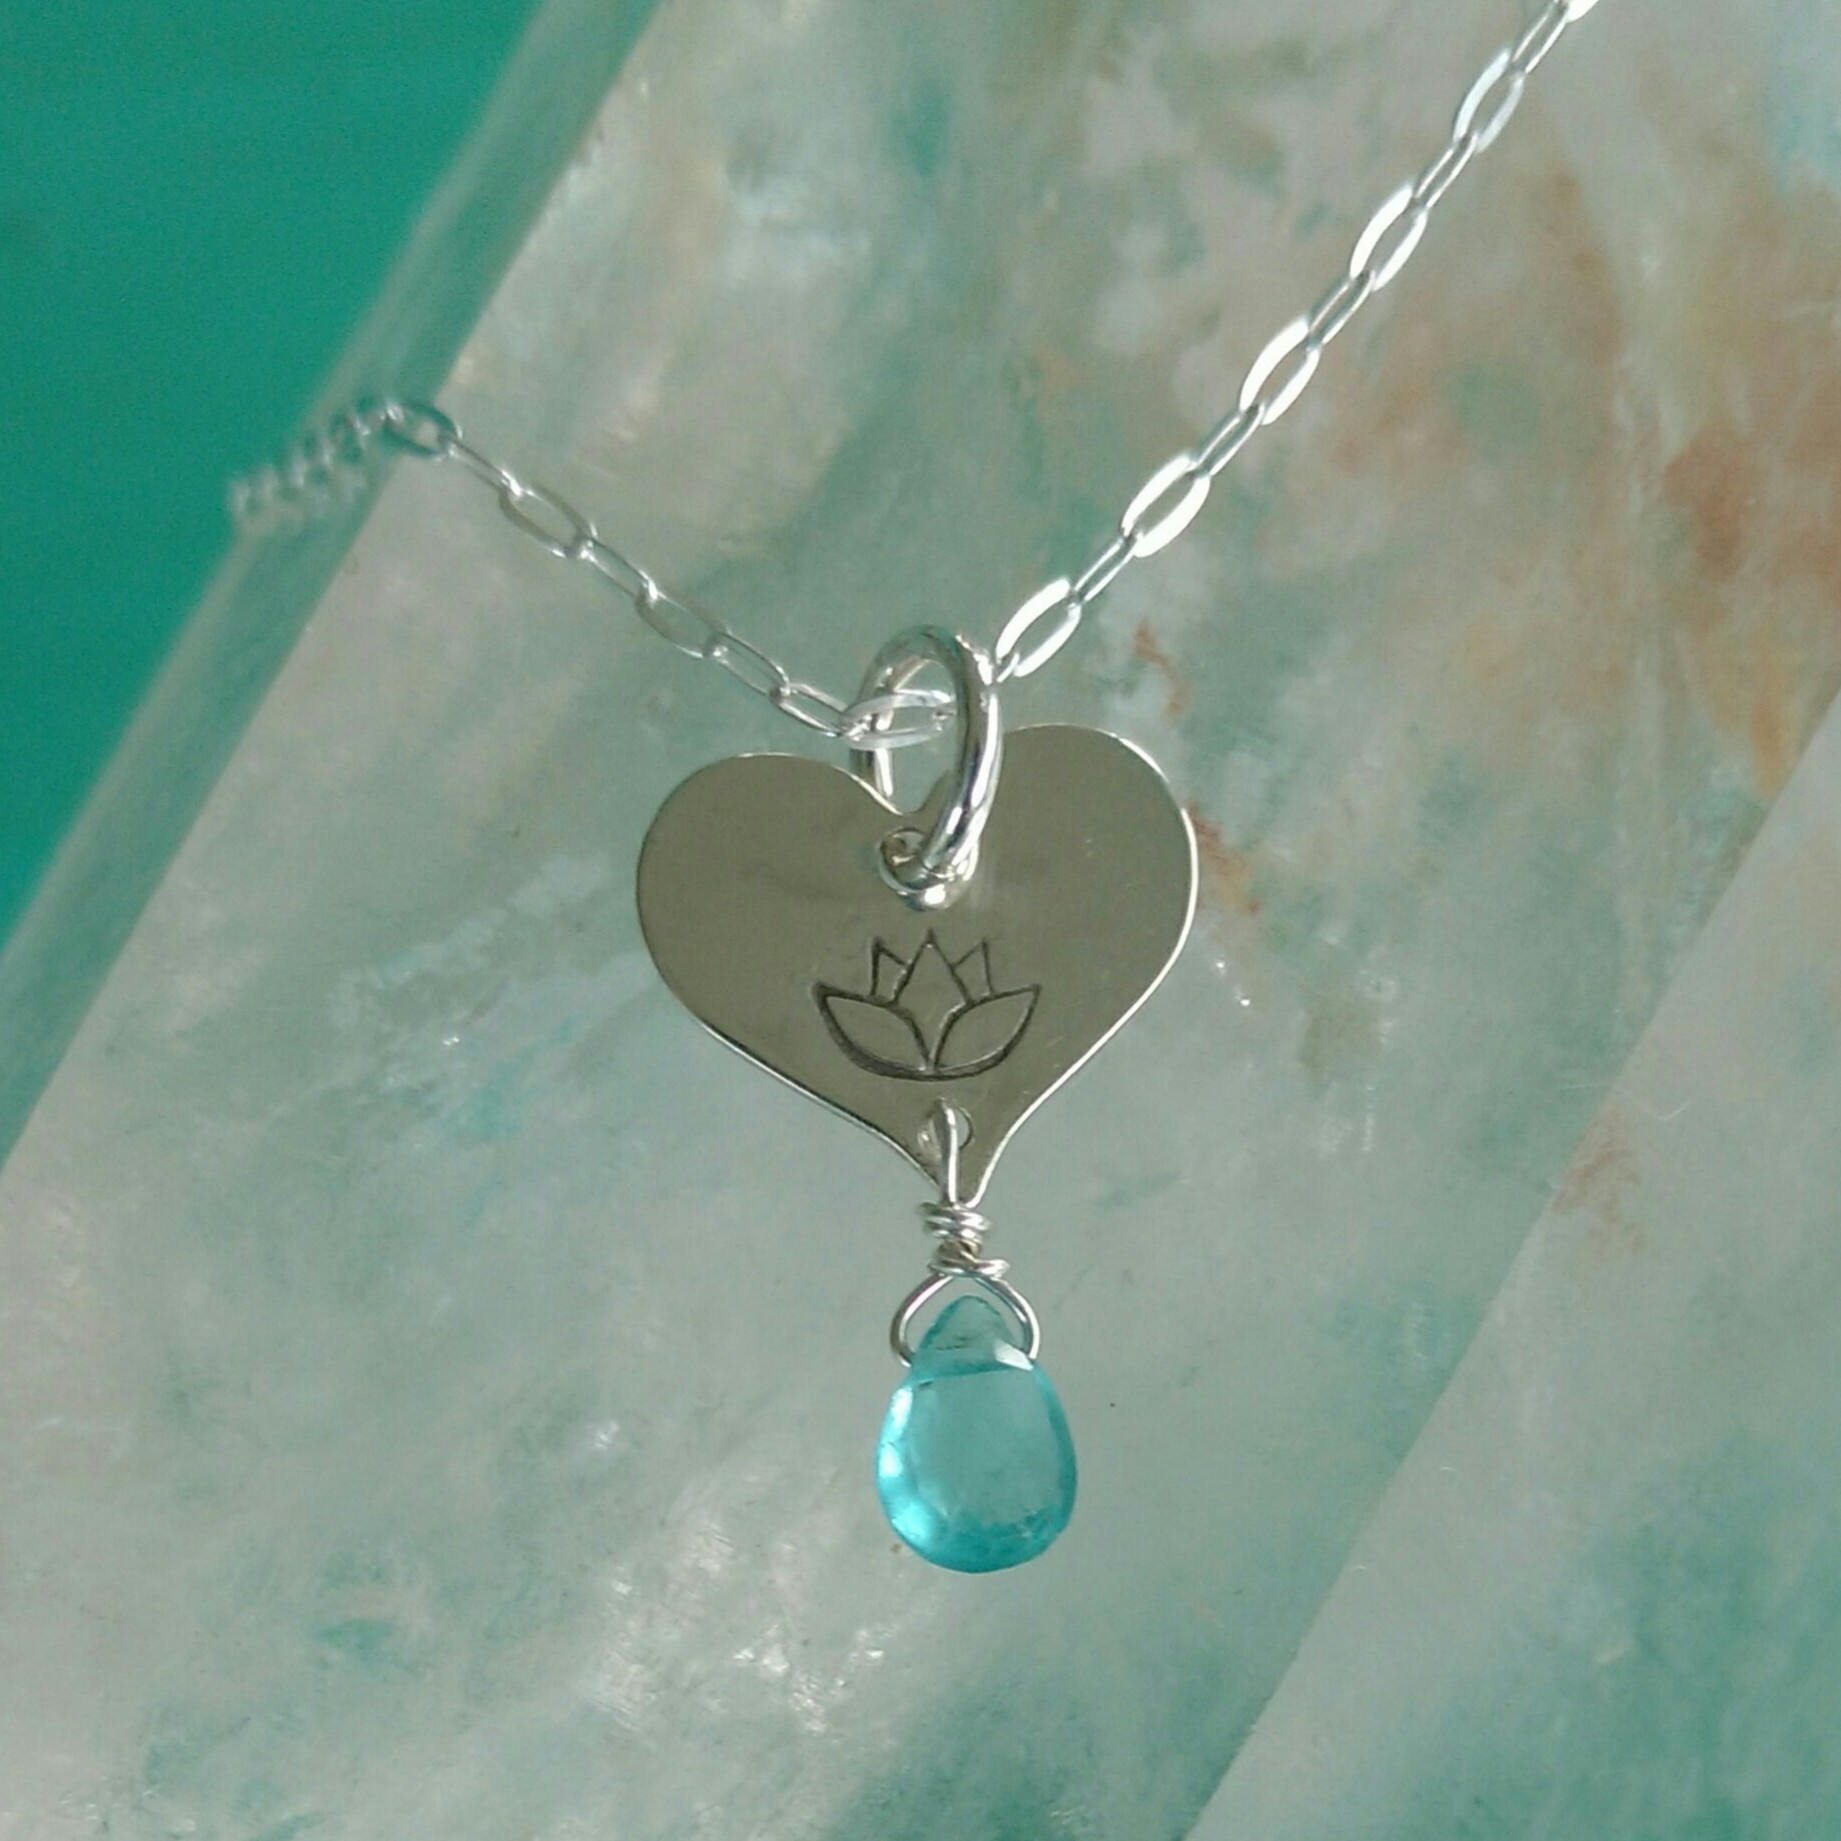 Lotus Love Charm With Apatite Lotus Flower Jewelry Tiny Heart